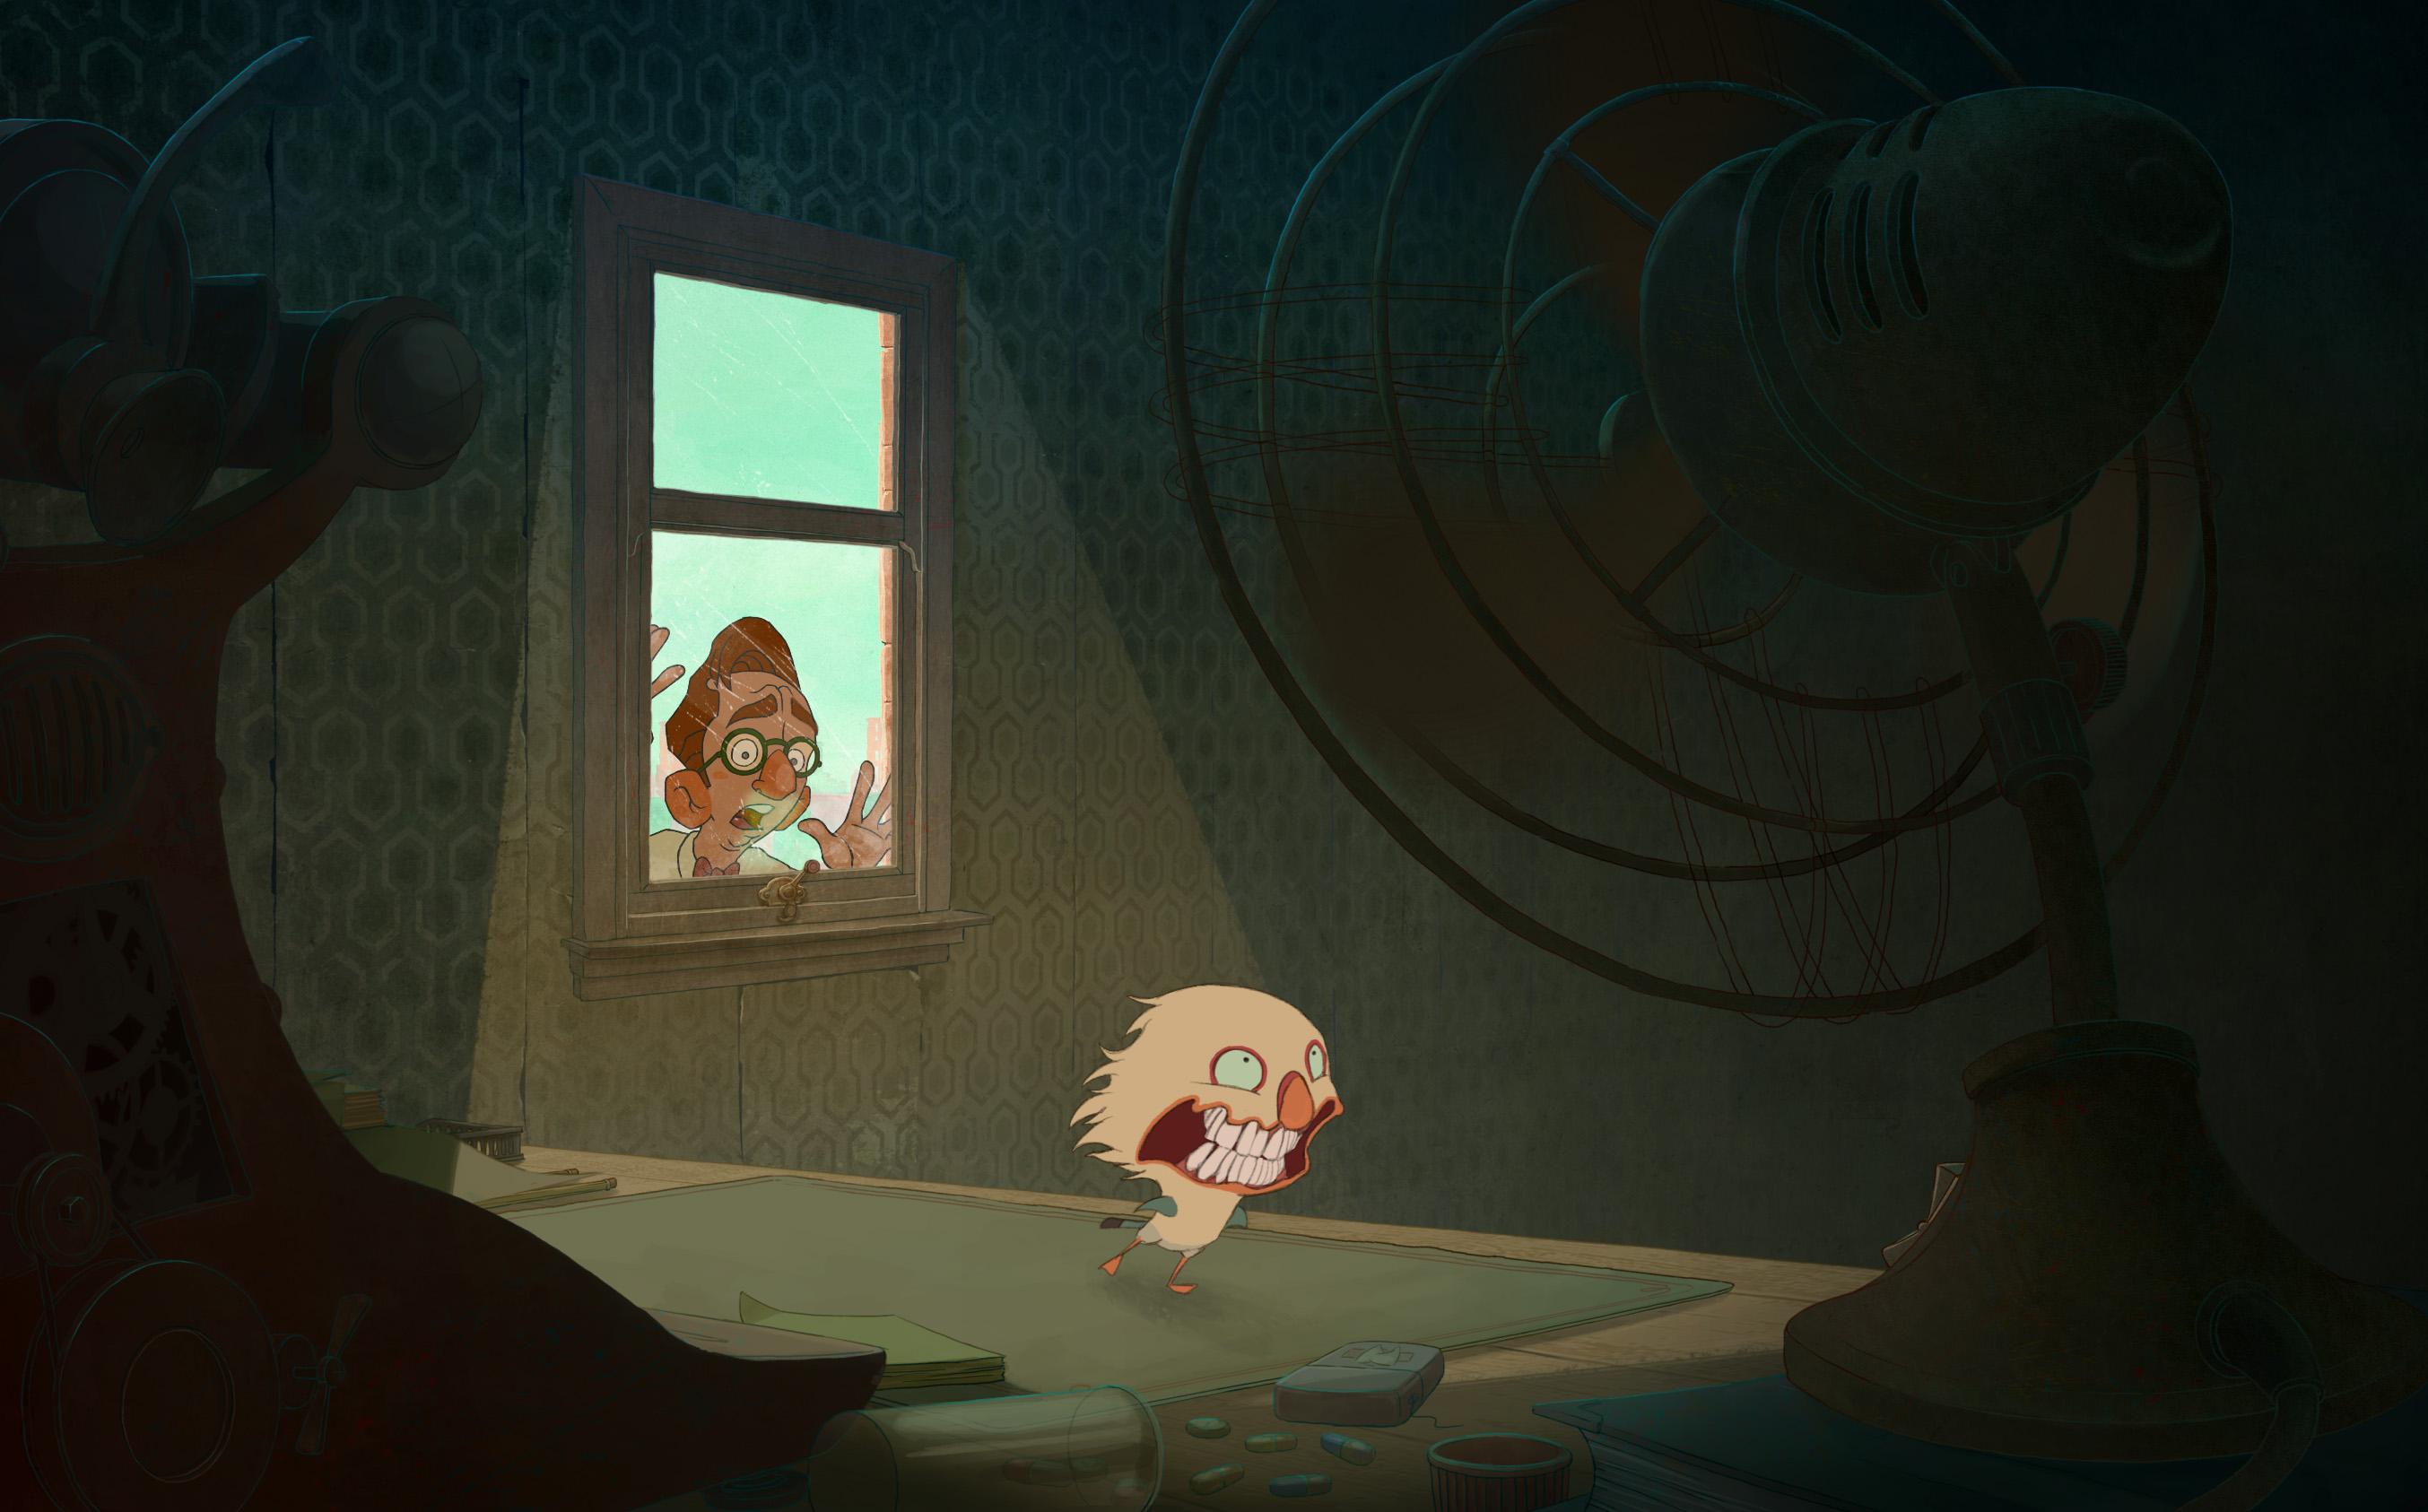 Cartoon Saloon | The_Ledge_End_of_Phil_STILL_LARGER_FILE - Cartoon